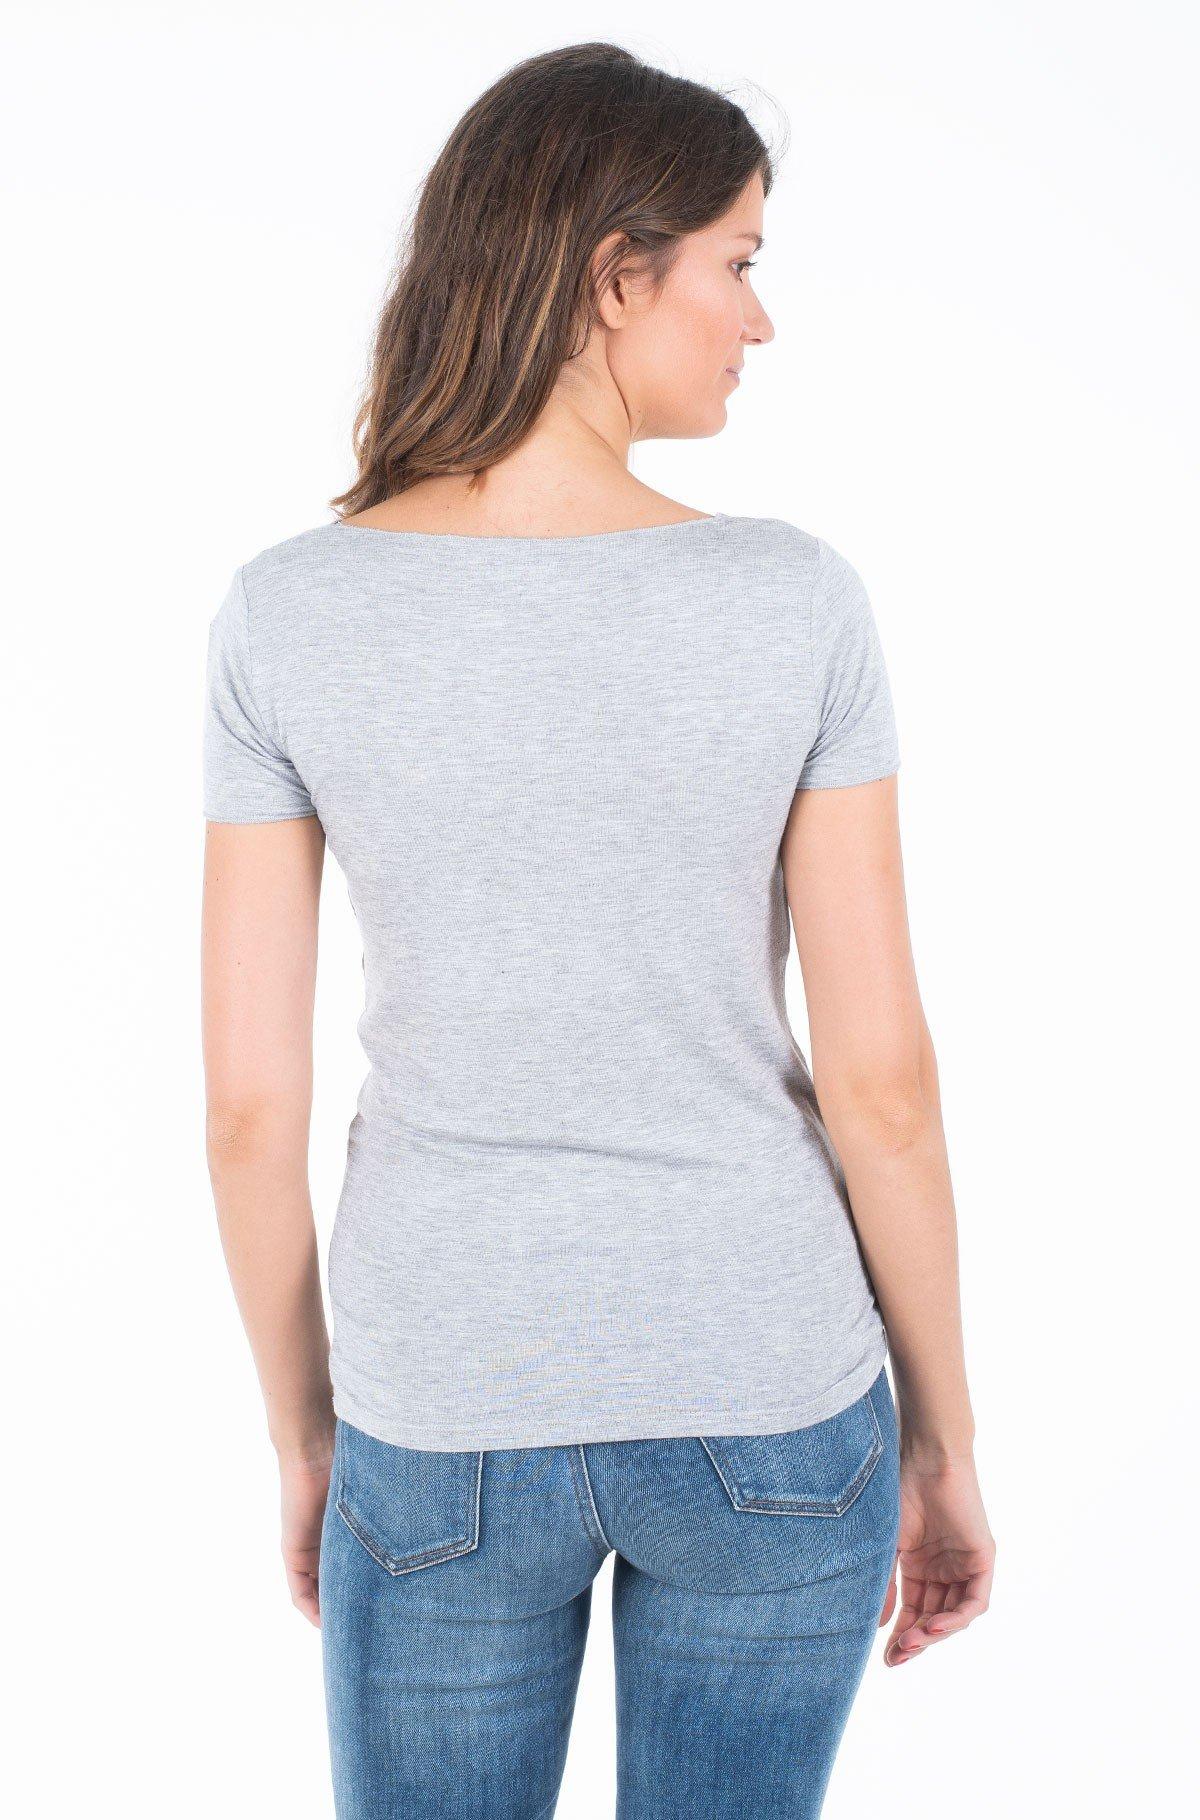 T-krekls MAELLE/PL504240-full-2